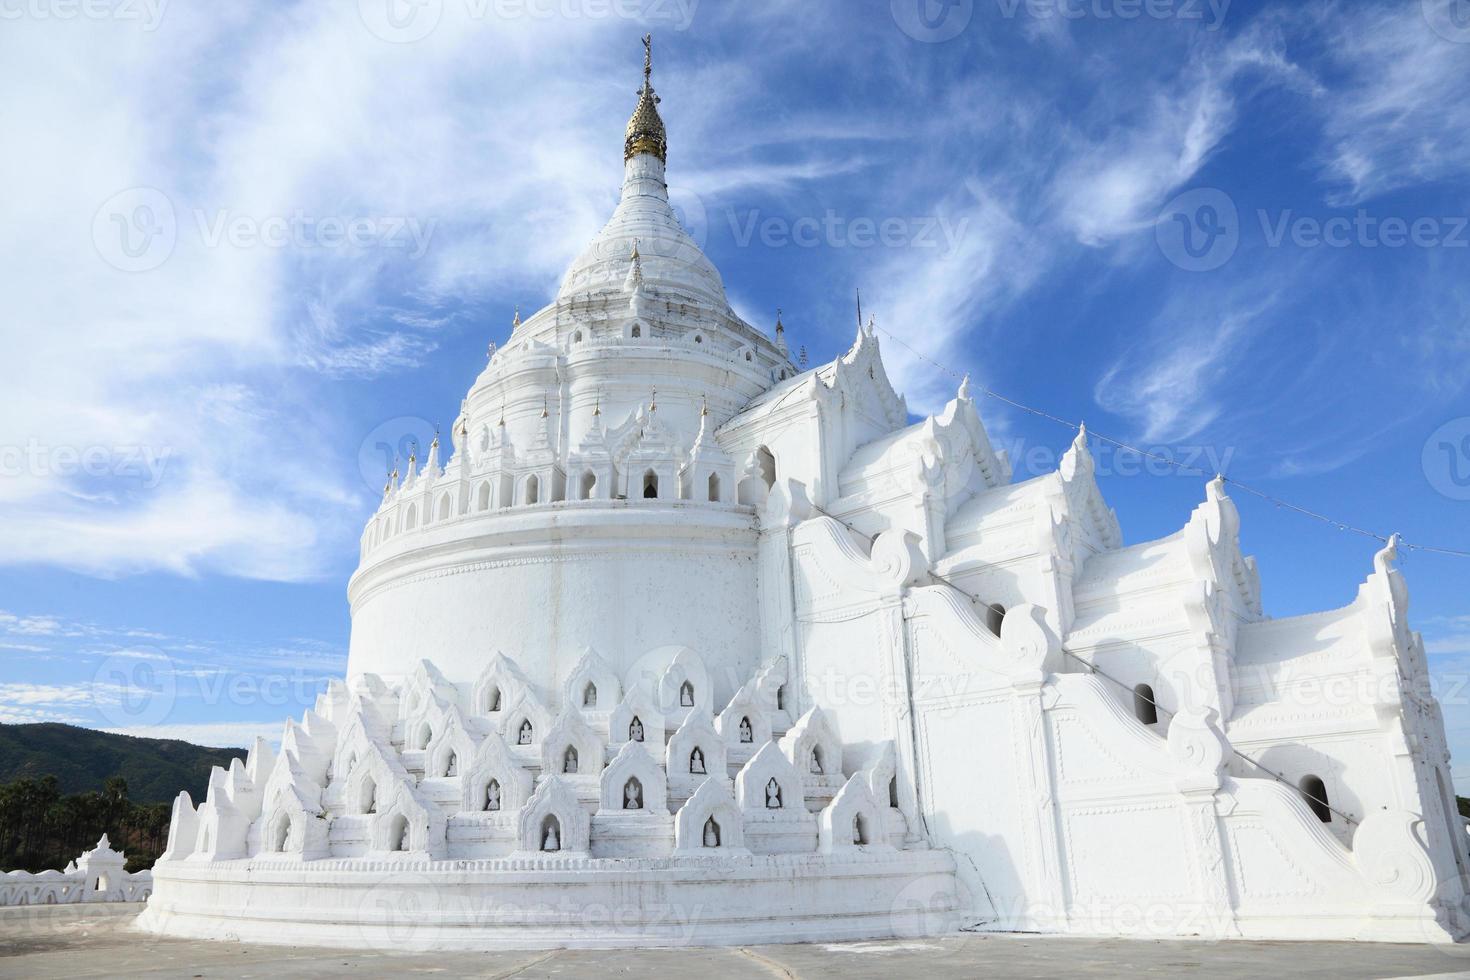 la pagode blanche mingun, mandalay - myanmar photo